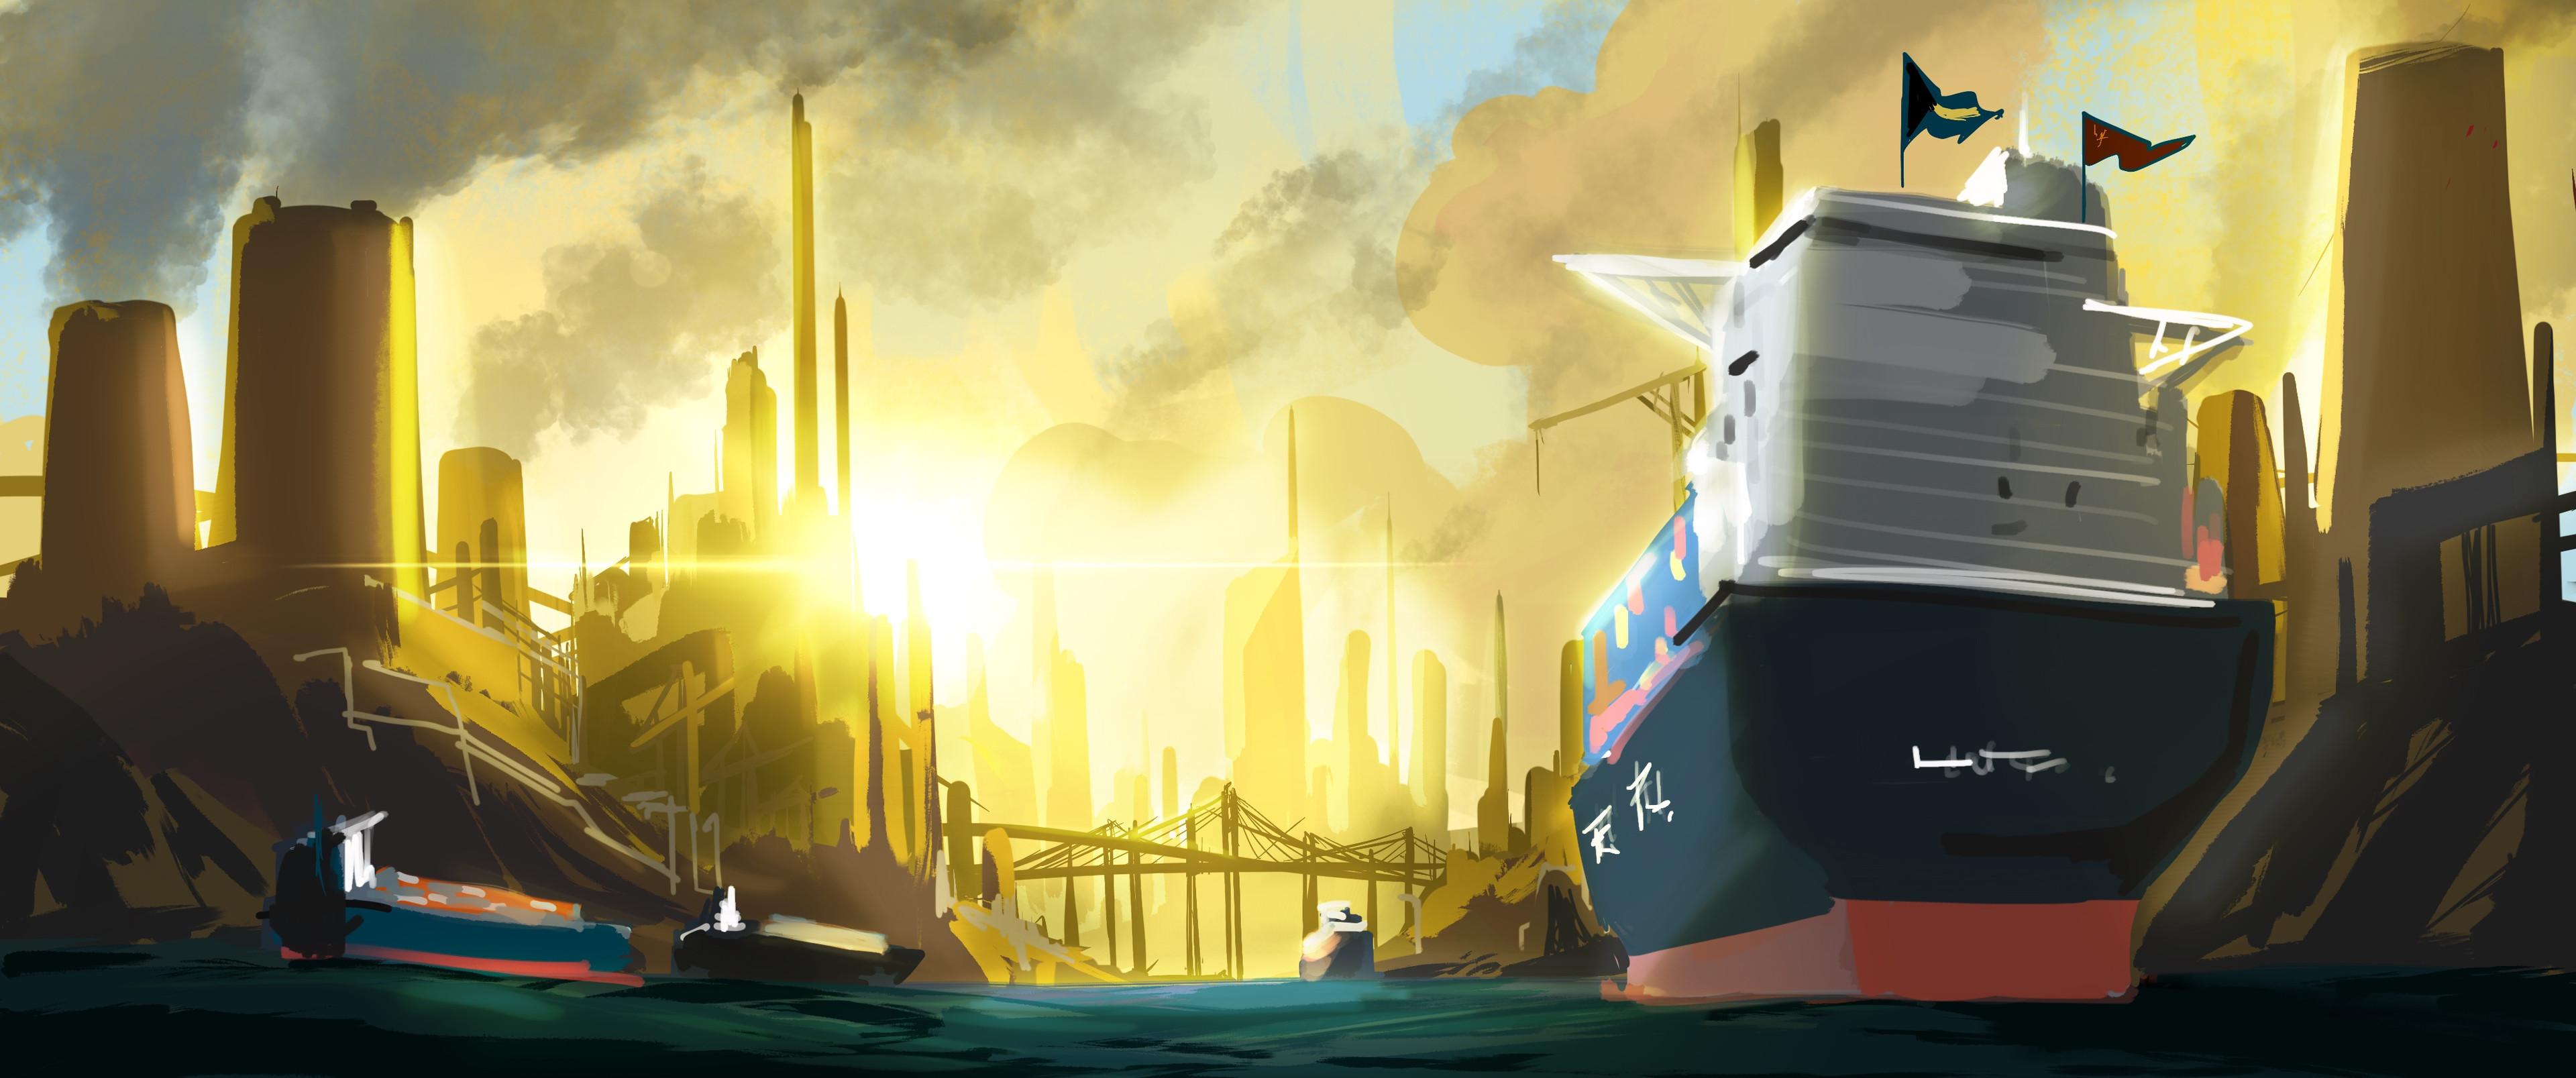 Industrial Island